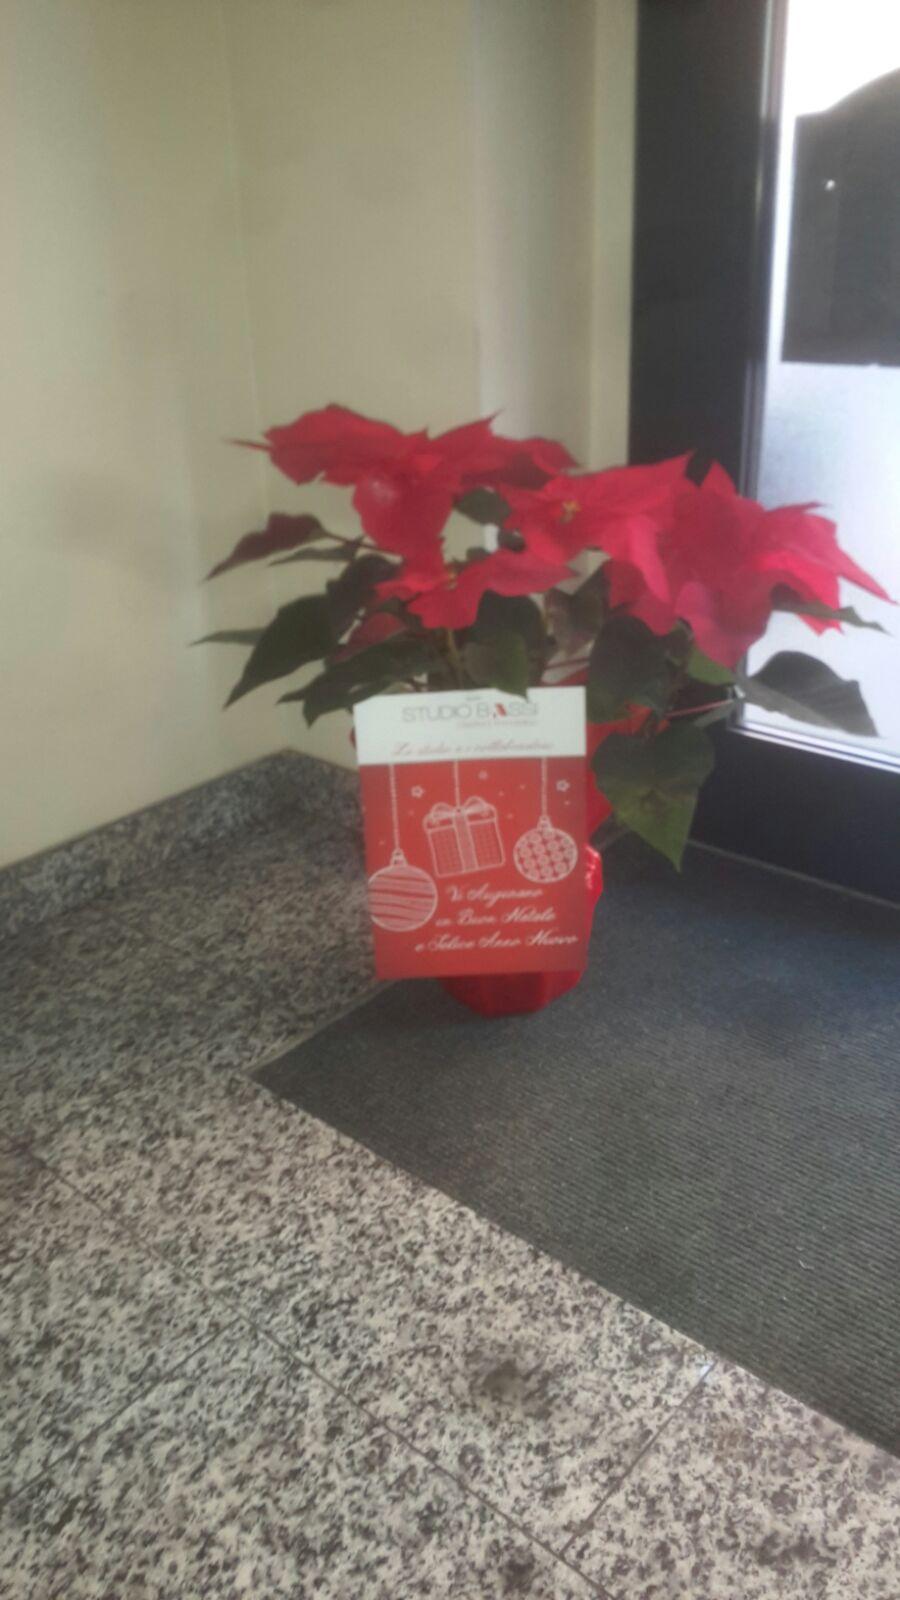 Stelle di Natale per Tutti i nostri Clienti condomini.